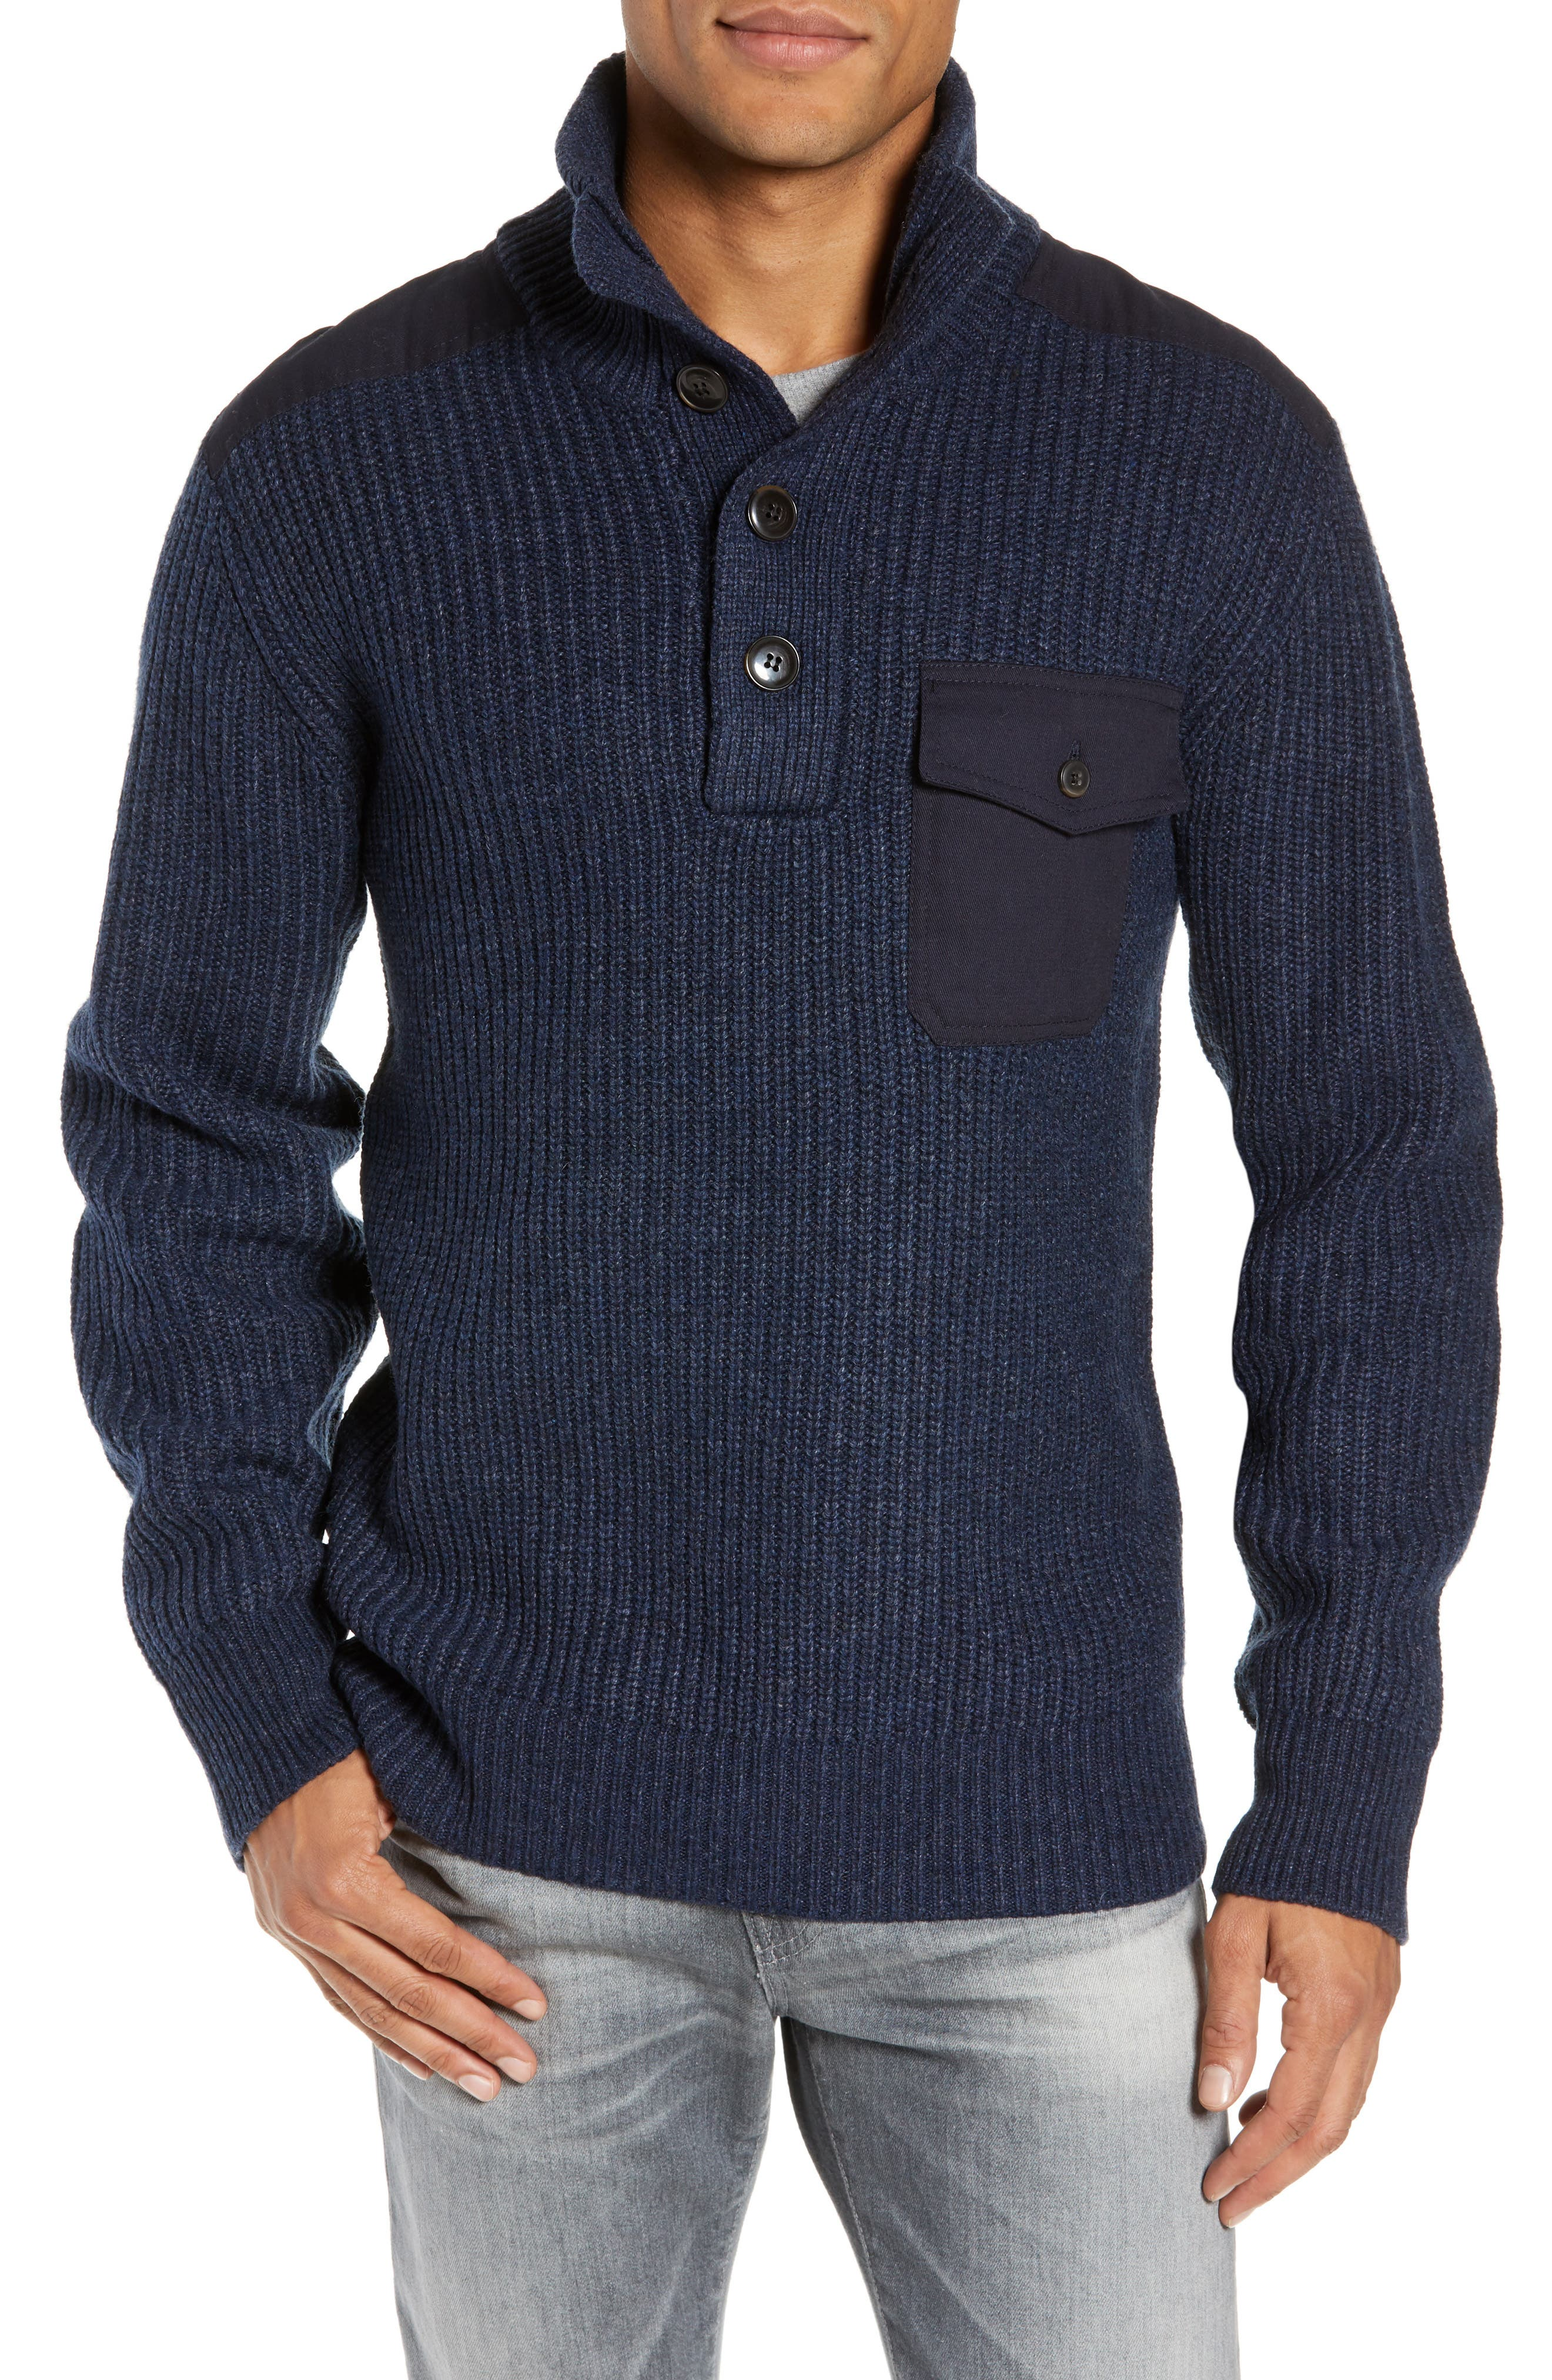 Schott Nyc Wool Blend Military Sweater, Blue